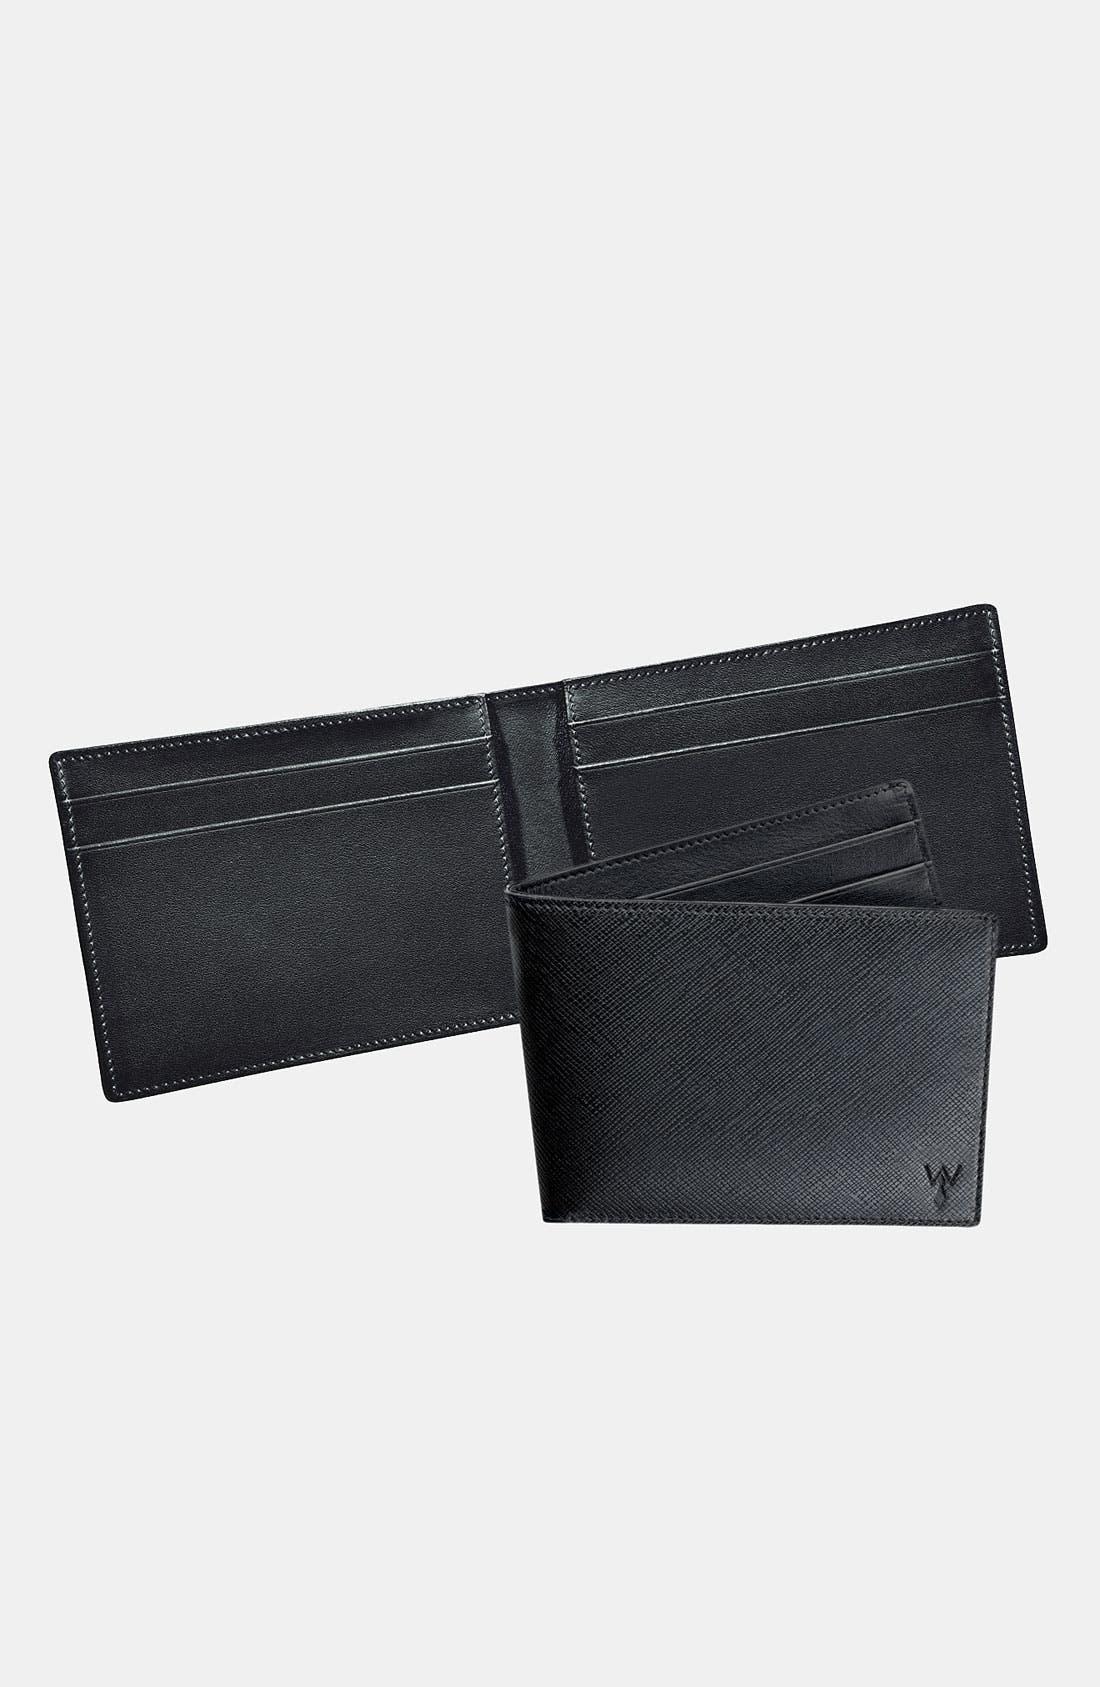 Main Image - Würkin Stiffs RFID Blocker Wallet